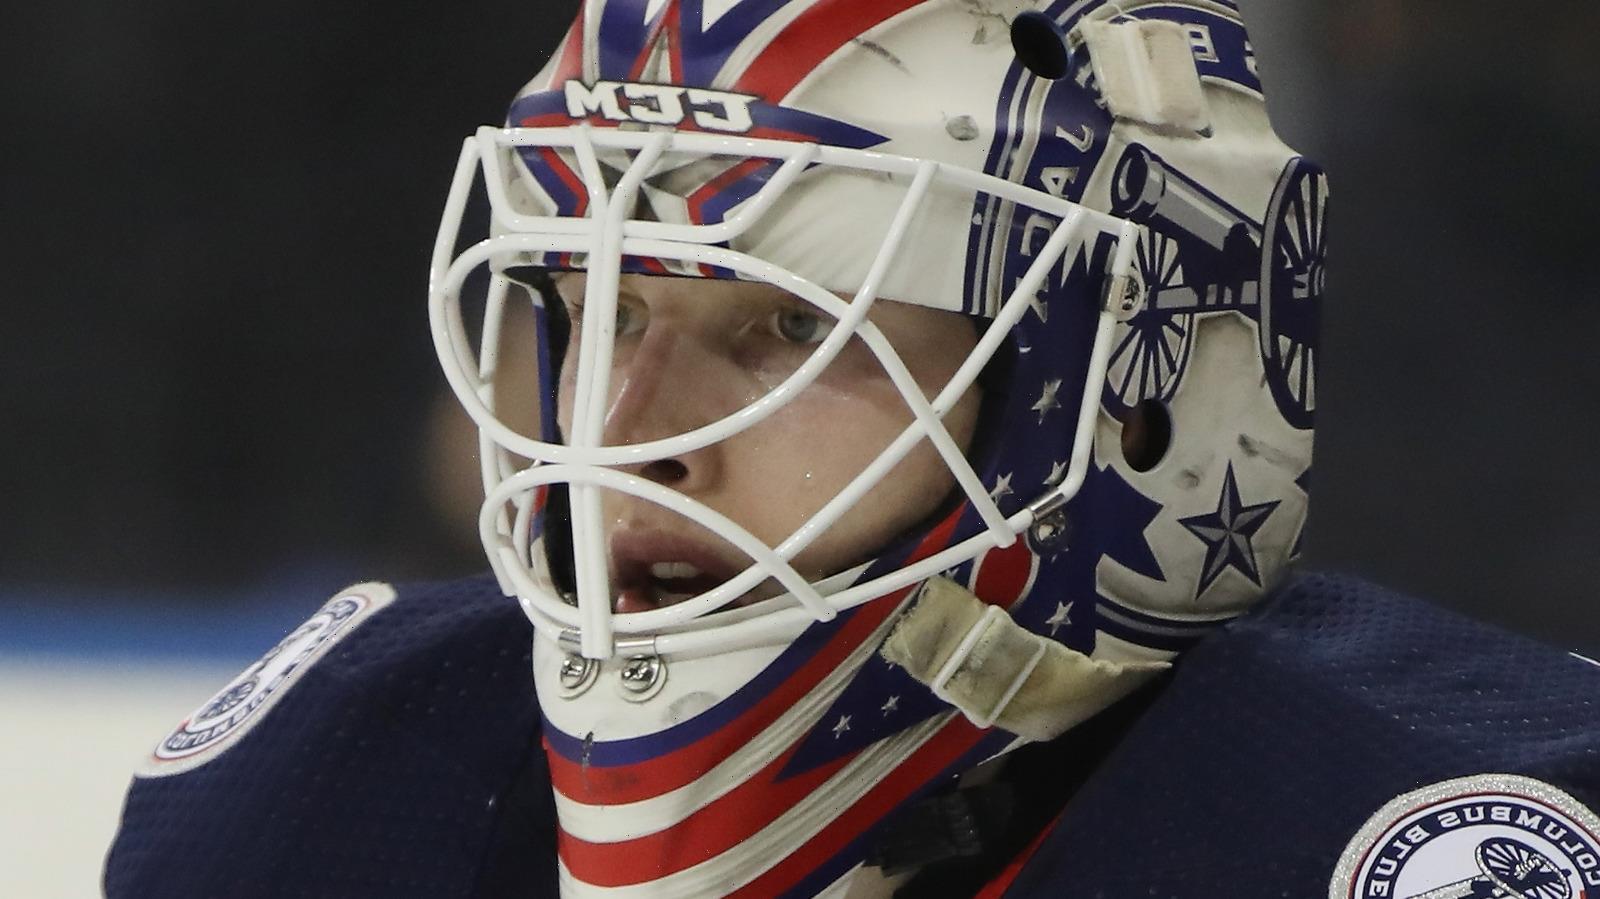 The Tragic Death Of NHL Goalie Matiss Kivlenieks